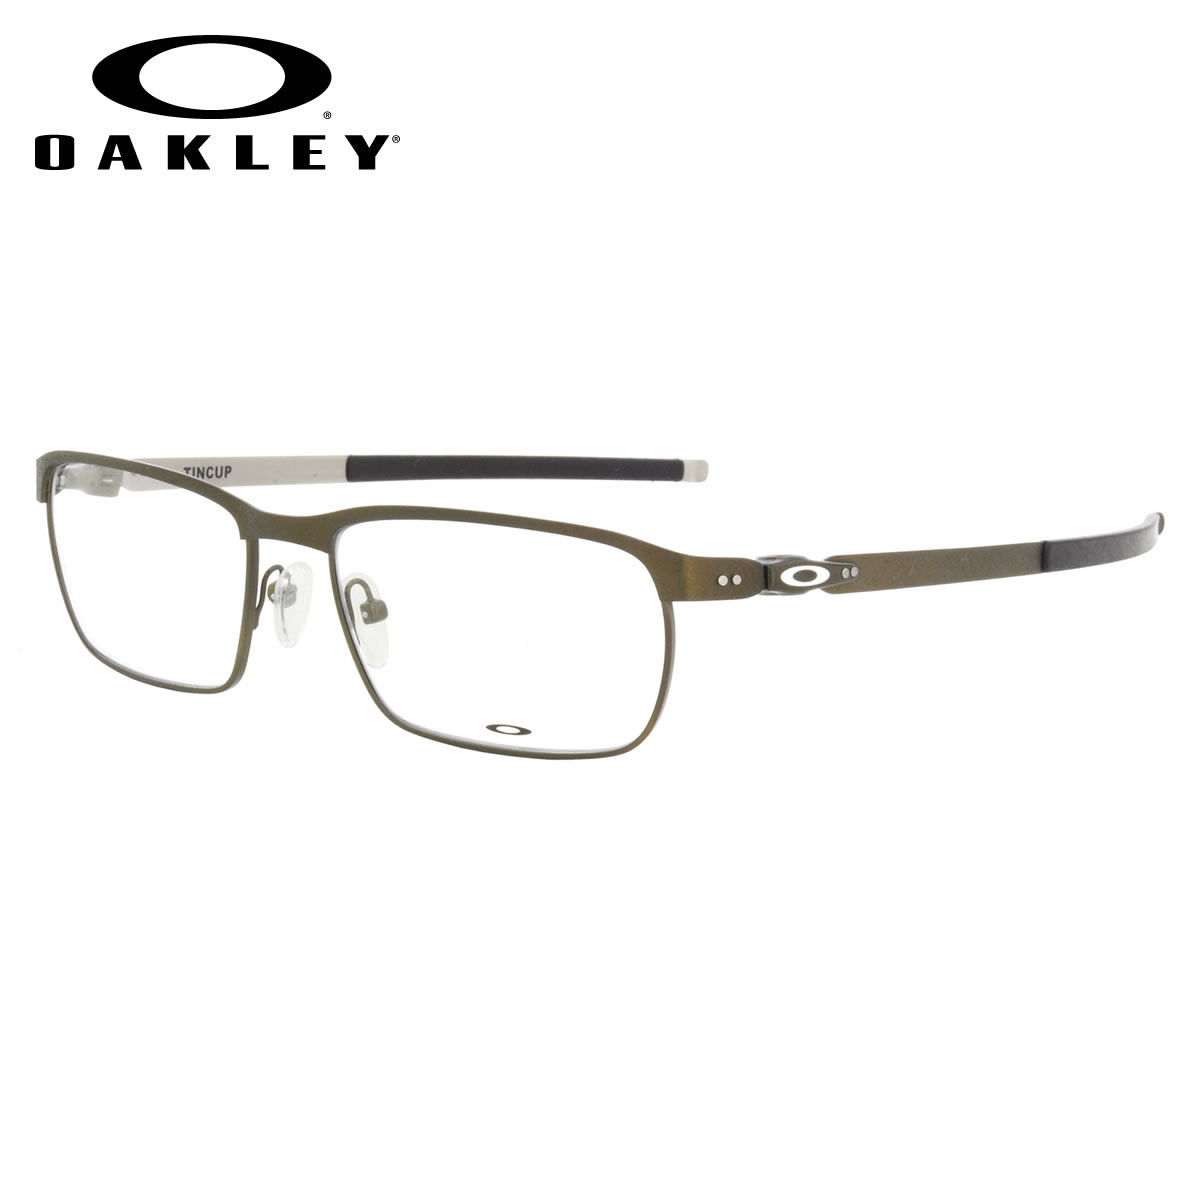 cc8288106e -OAKLEY glasses OX3184-0254 TINCUP Powder Pewter Tin square OAKLEY ITA  eyeglass lens free men women